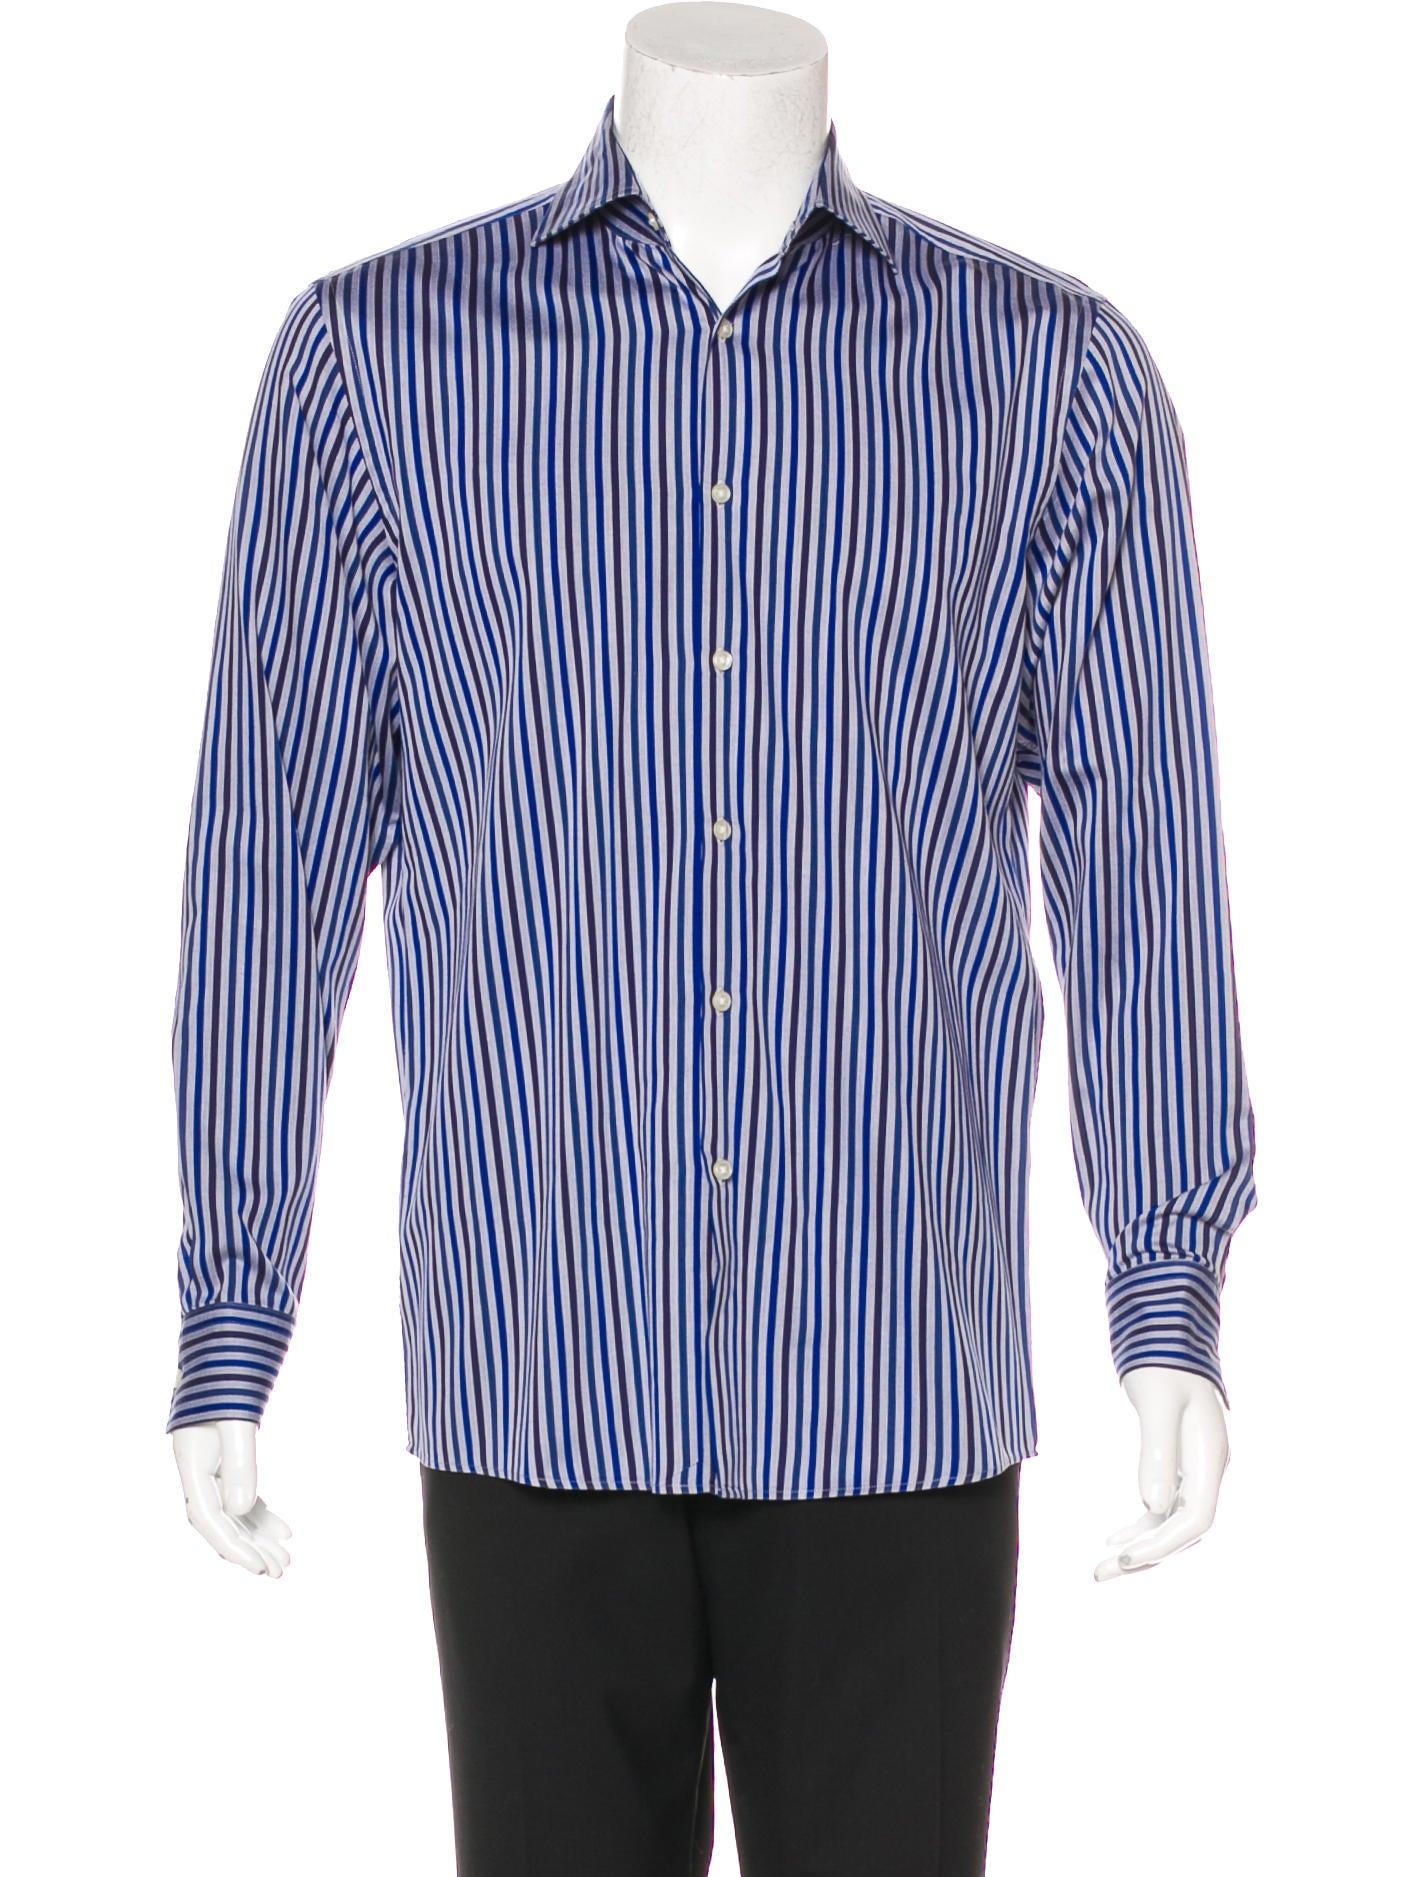 Boss by hugo boss miles striped shirt clothing for Hugo boss dress shirts